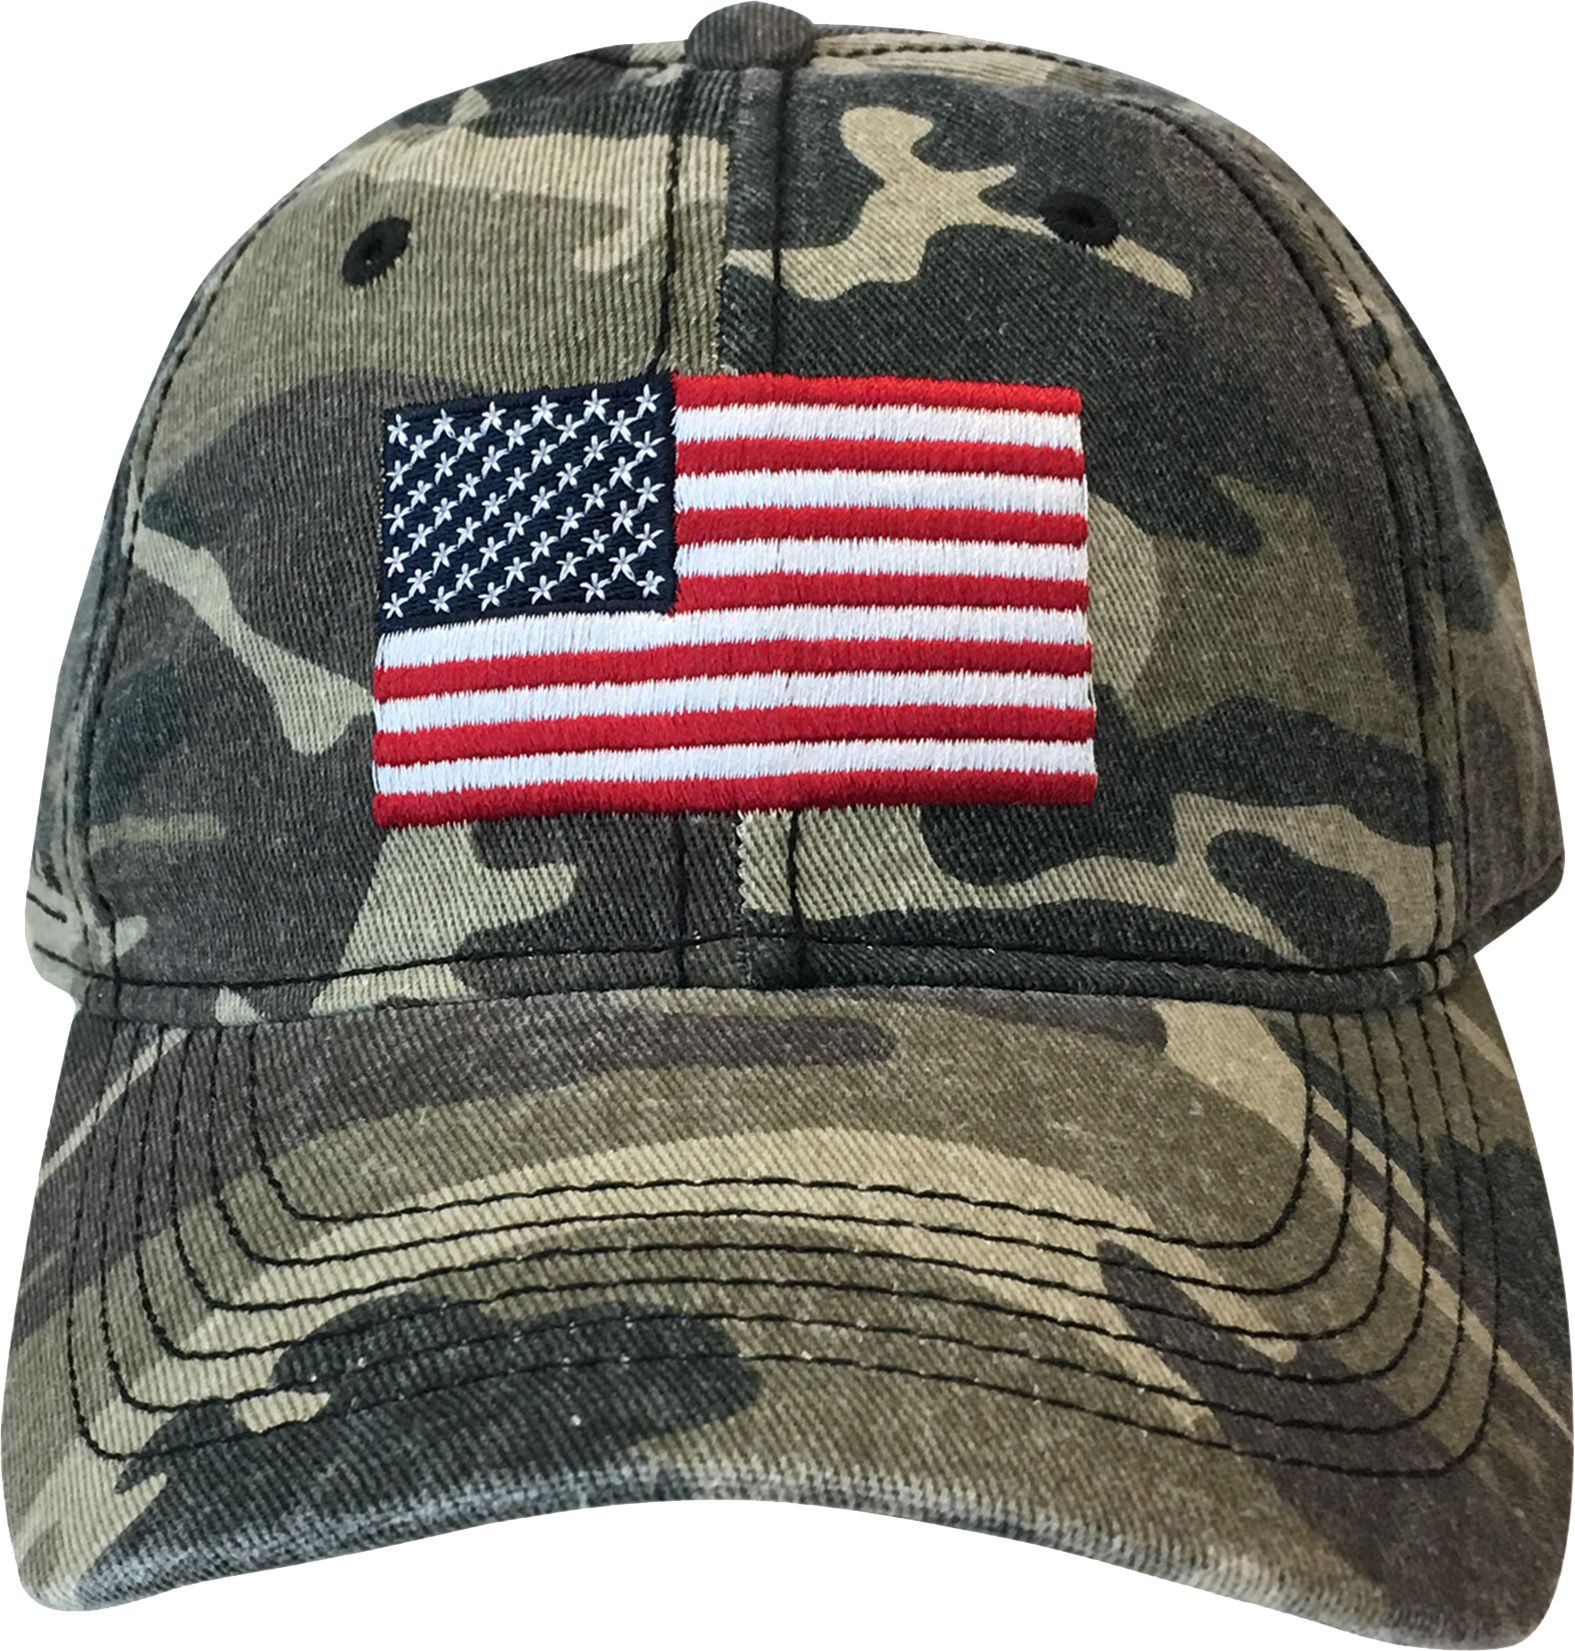 Field & Stream Women's Washed Americana Flag Hat, Camo